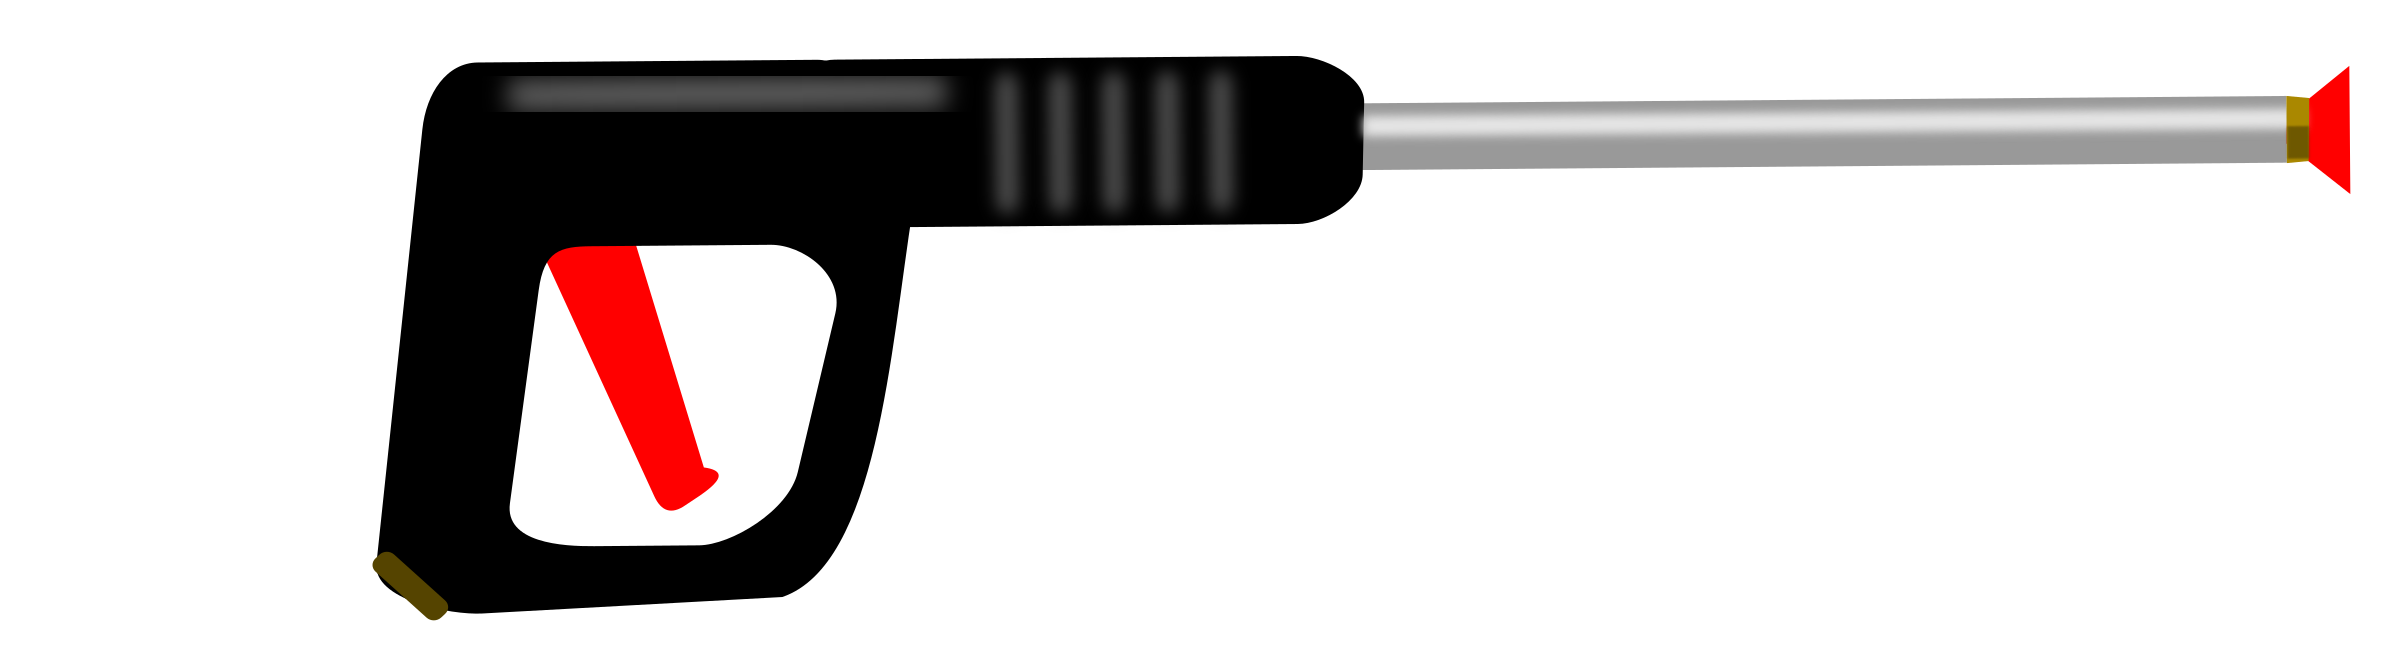 Clipart gun vector. Pressure washer wand big